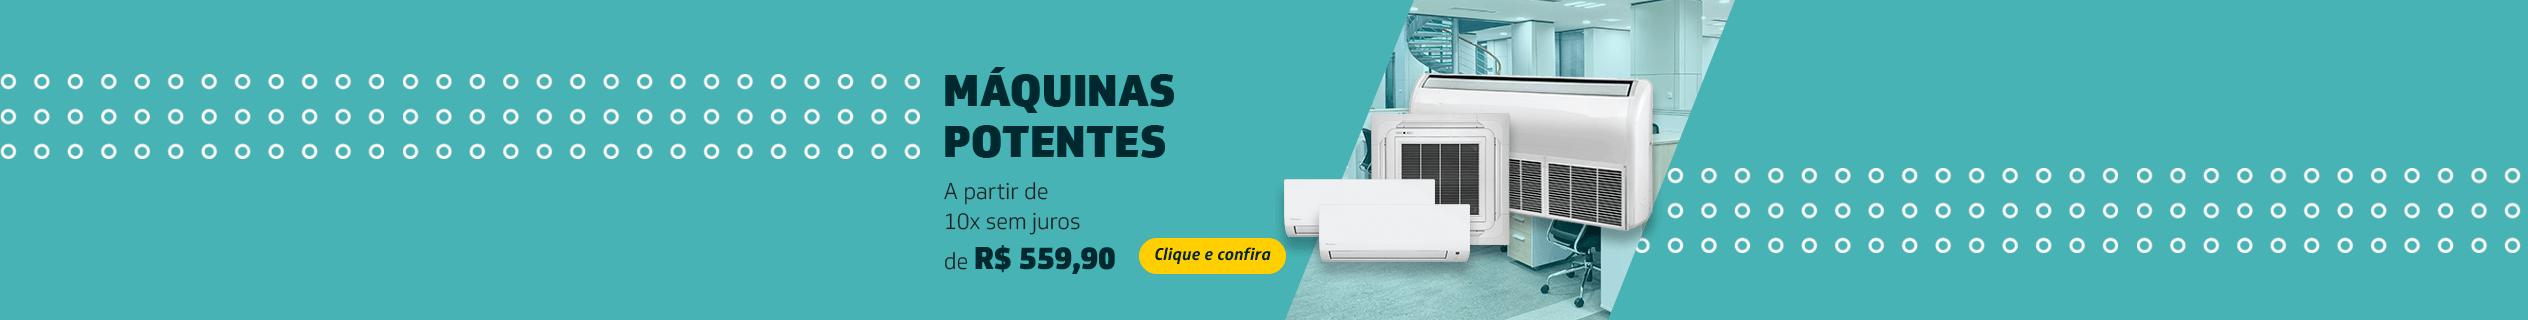 full_banner-desktop-maquinas_grandes-2210-2810